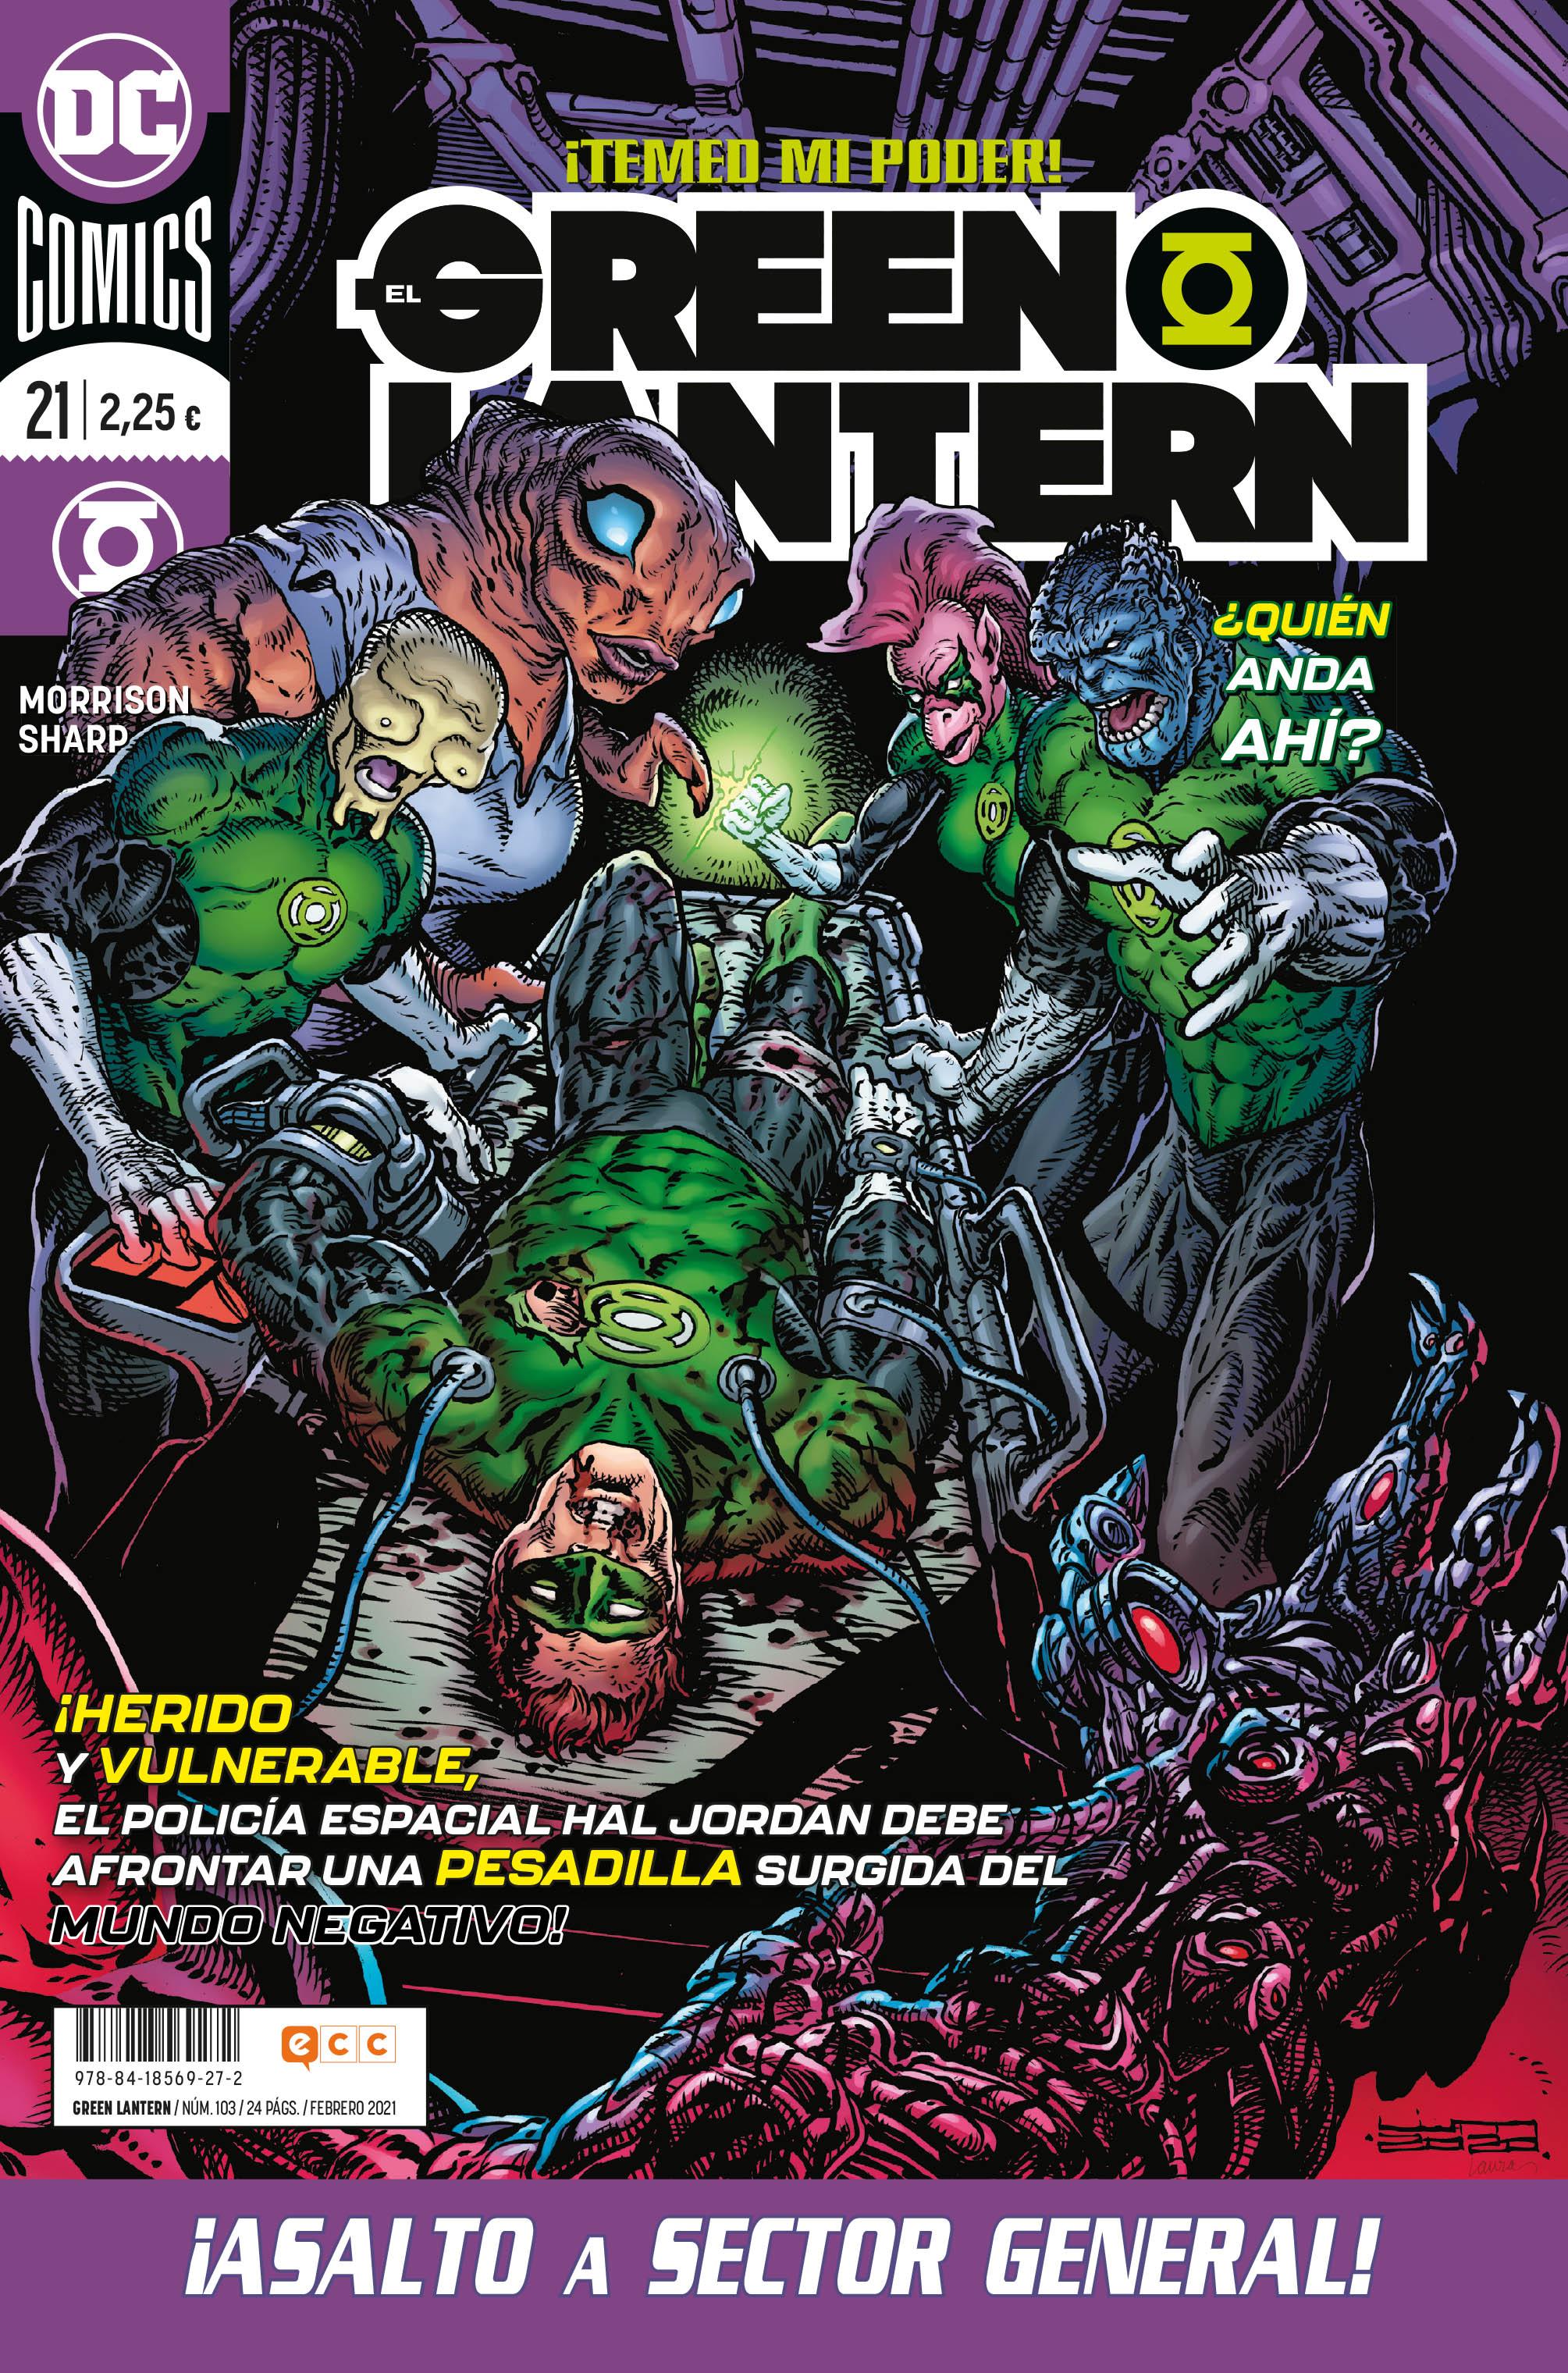 El Green Lantern #103 / 21